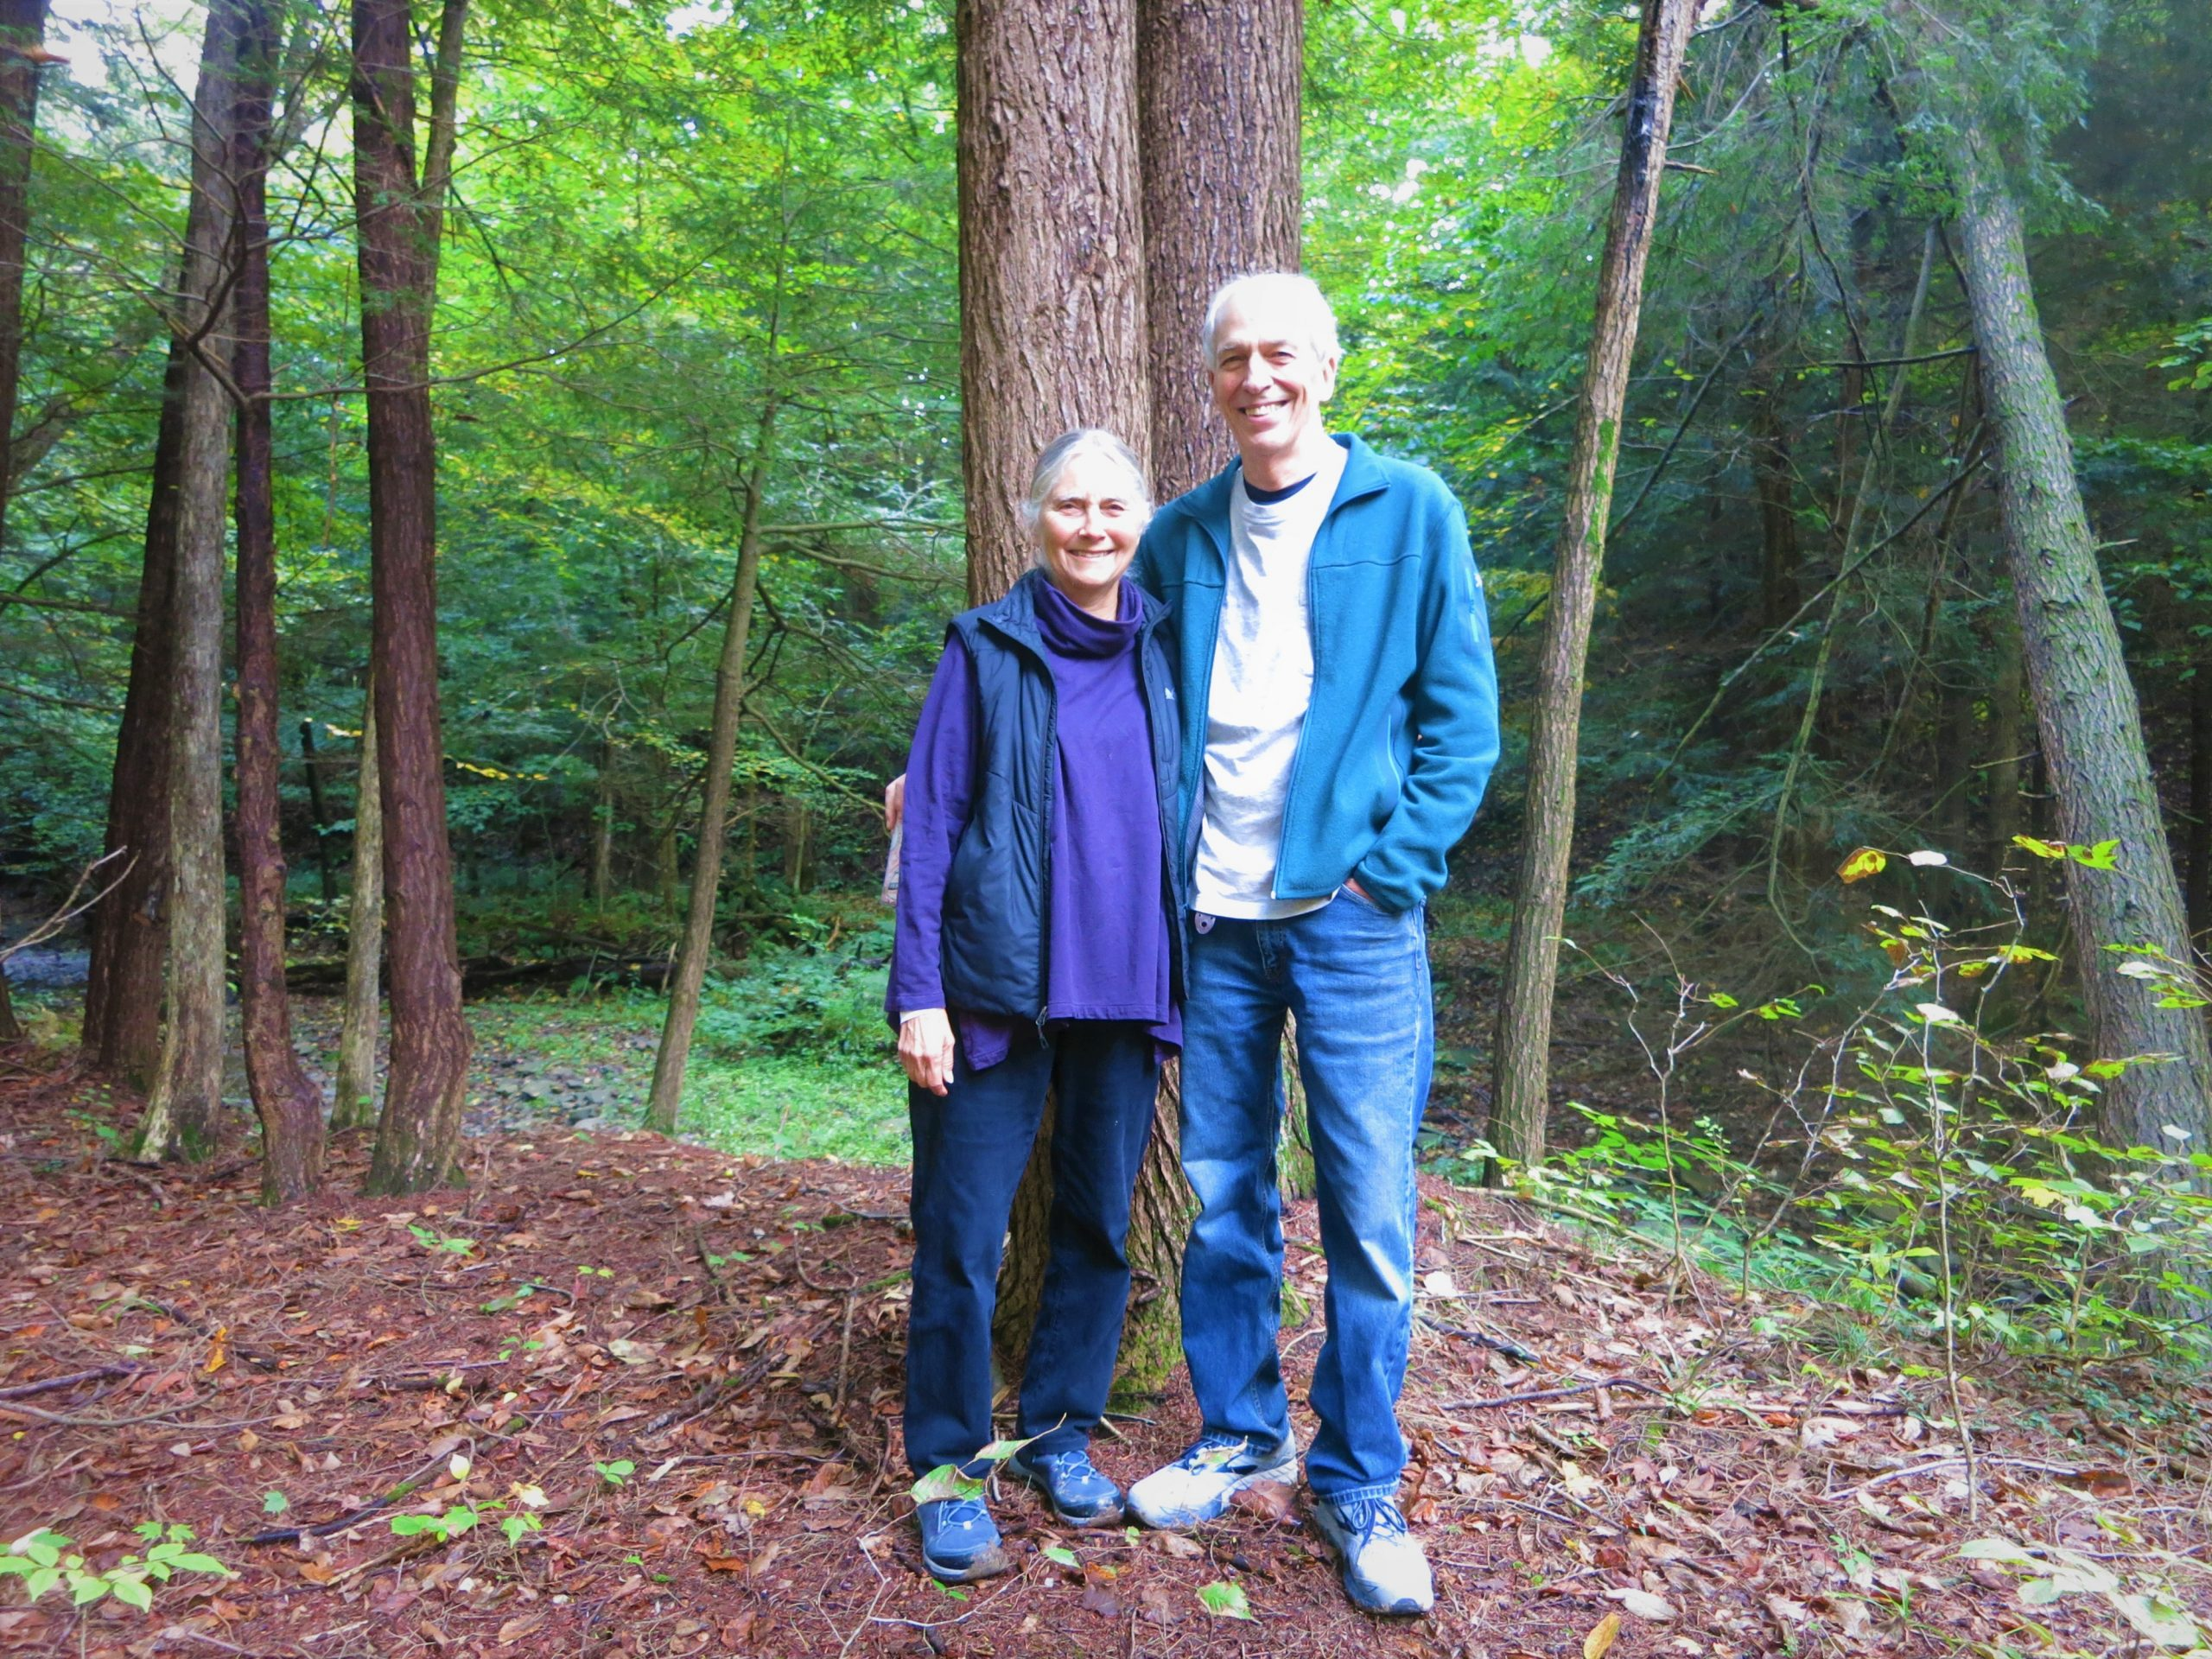 Forest Conservation Planning